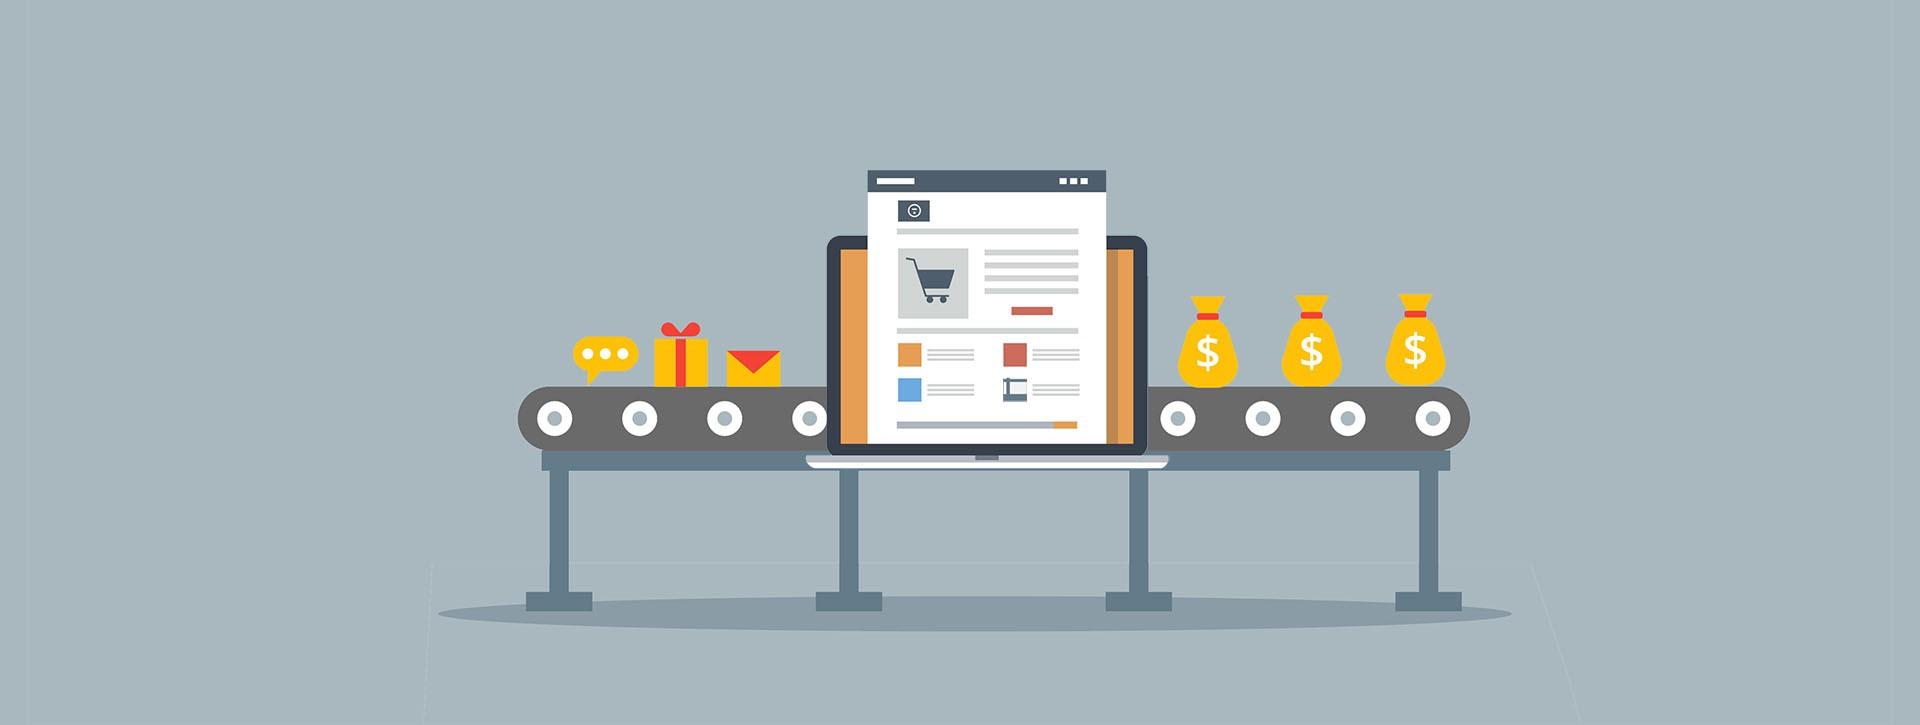 Top Marketing Keywords Search On Google